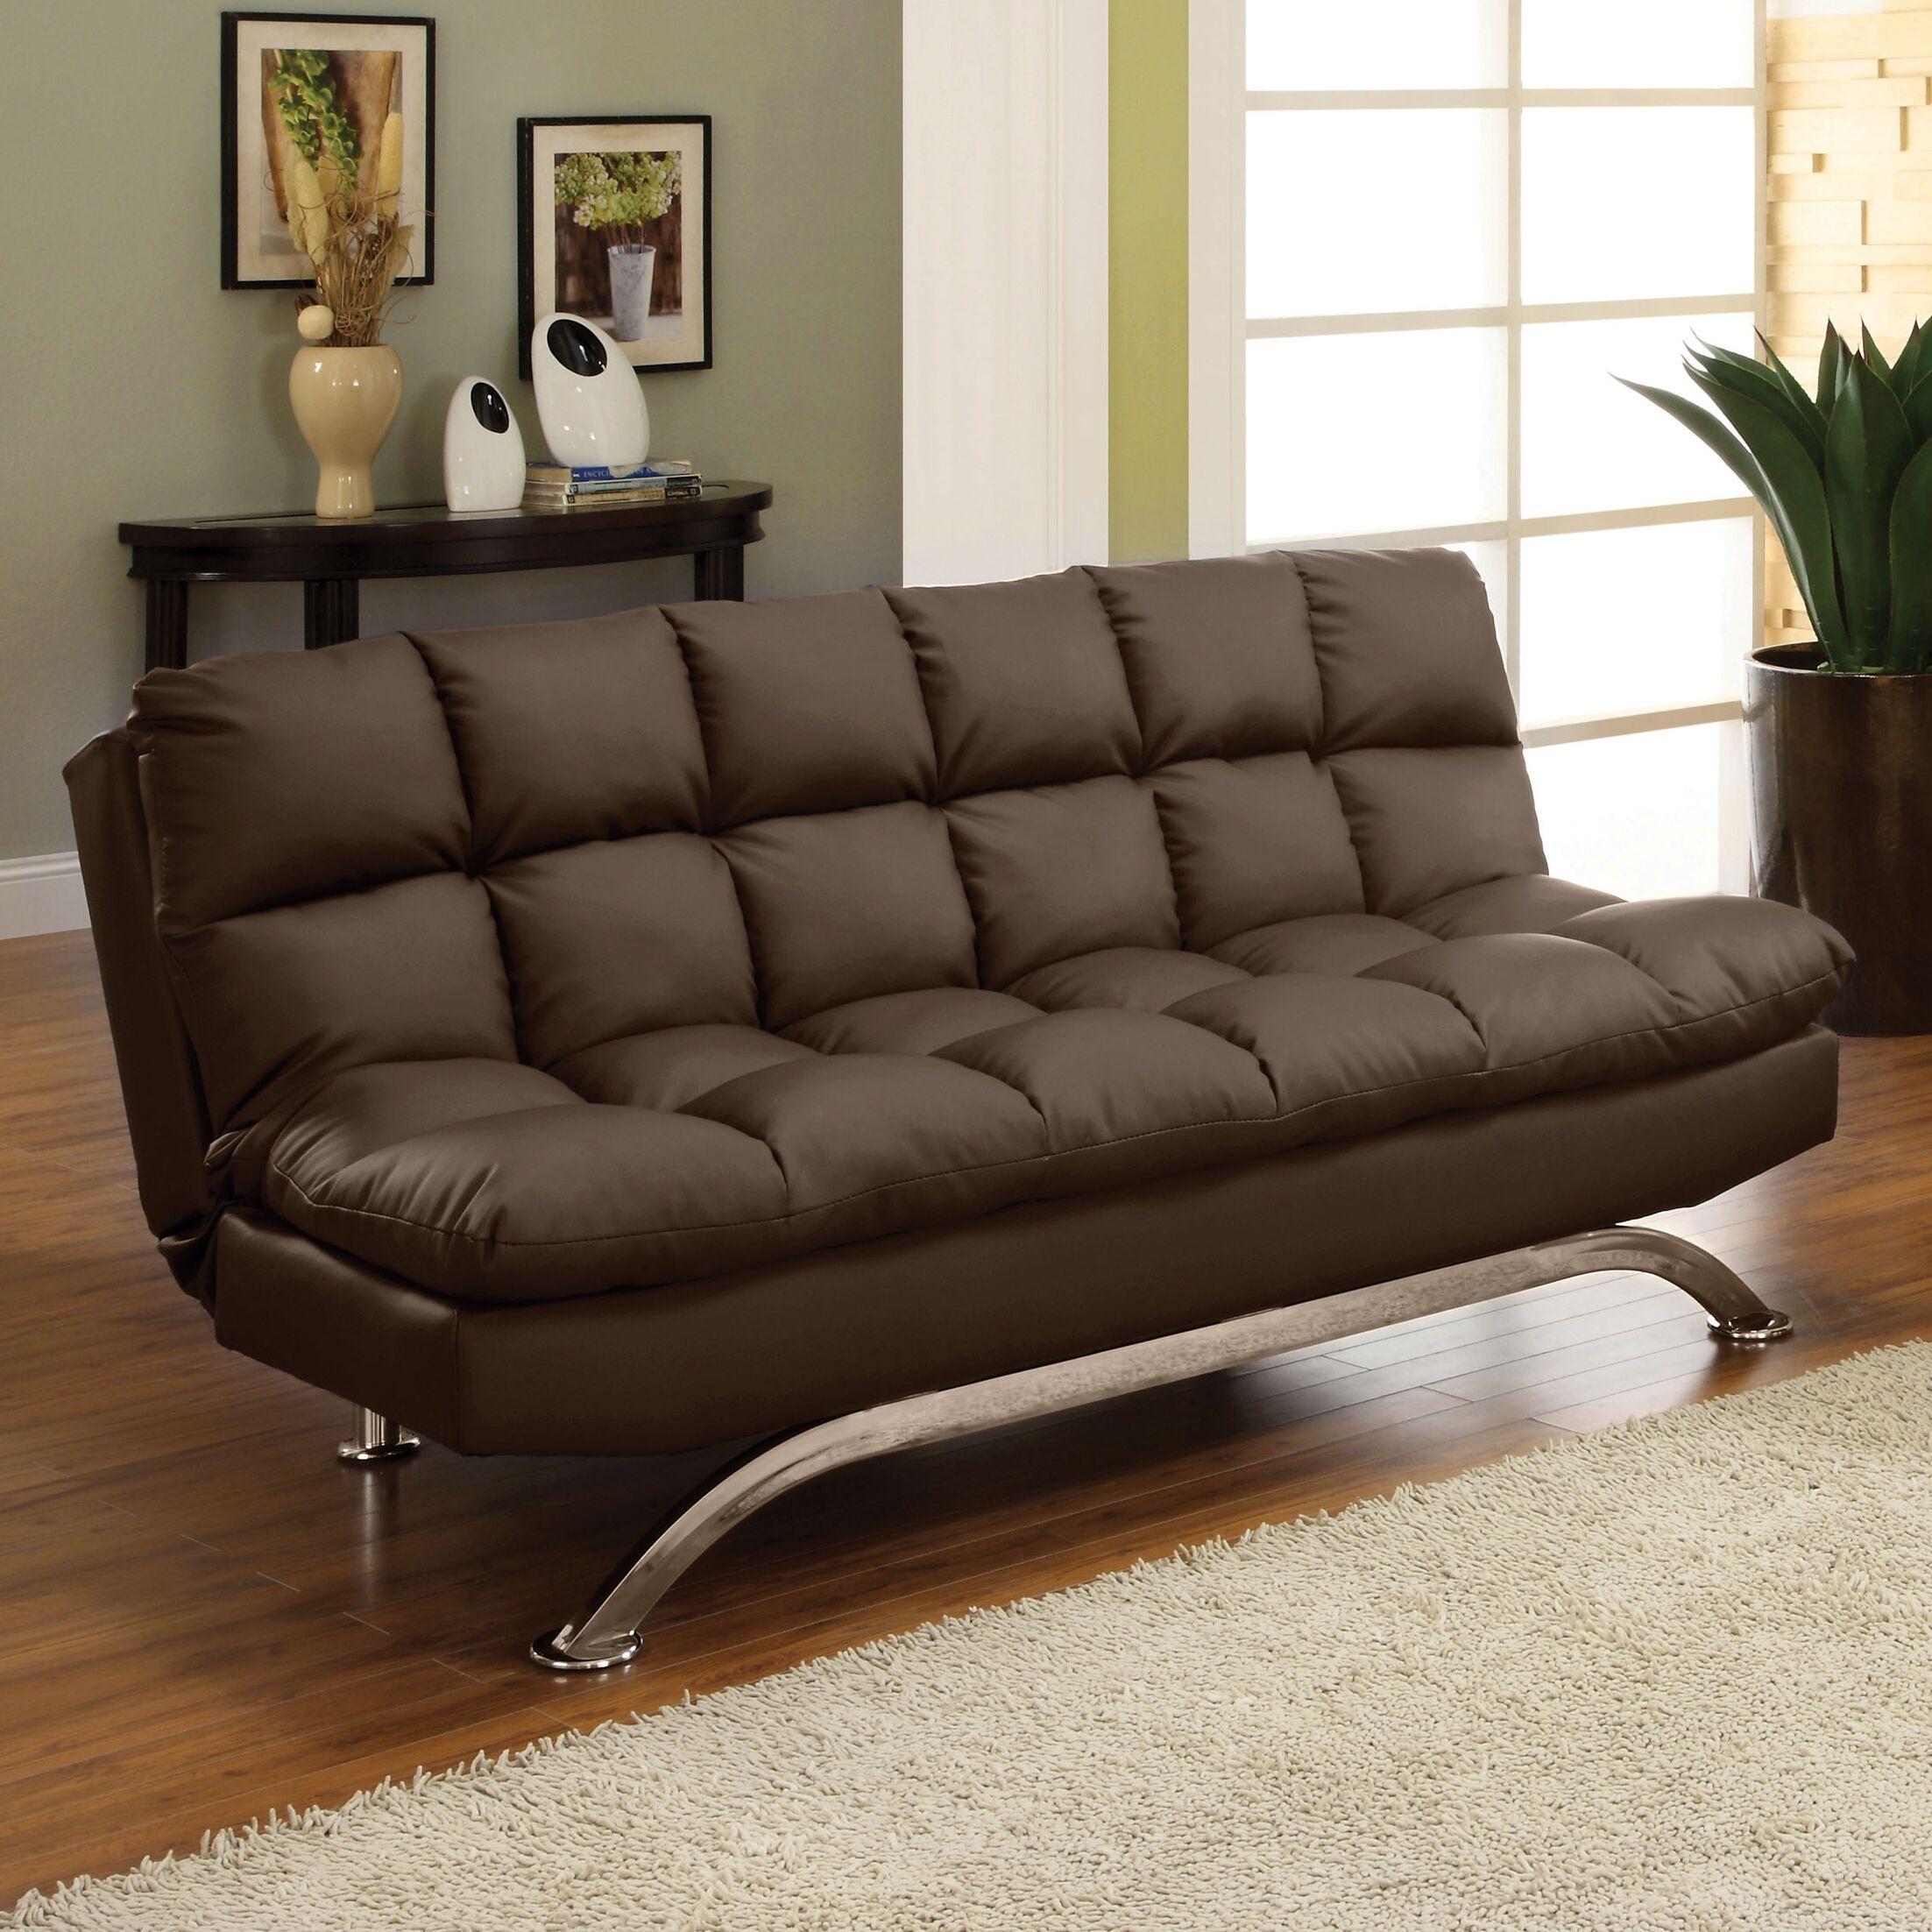 Pennock Sleeper Sofa Upholstery: Dark Espresso